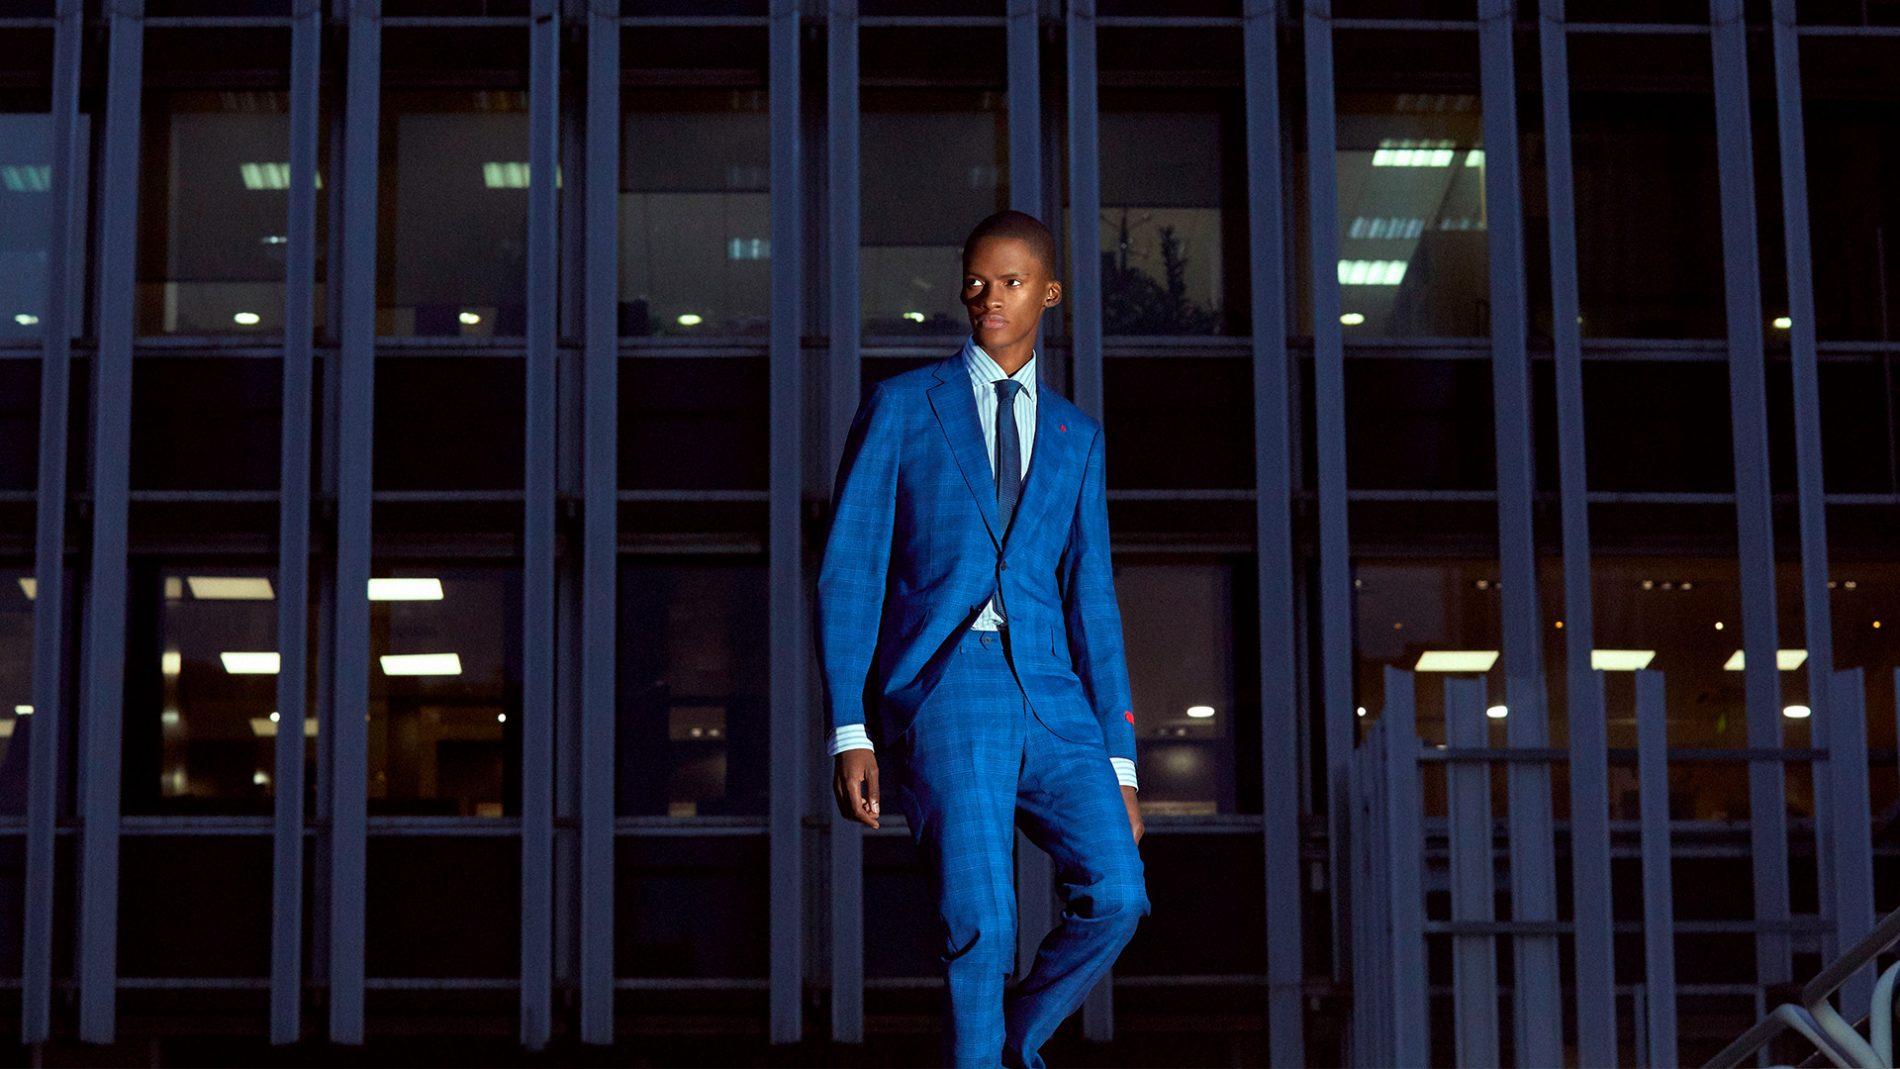 El Corte Inglés Designer Menswear Tailored Clothing Isaia Givenchy